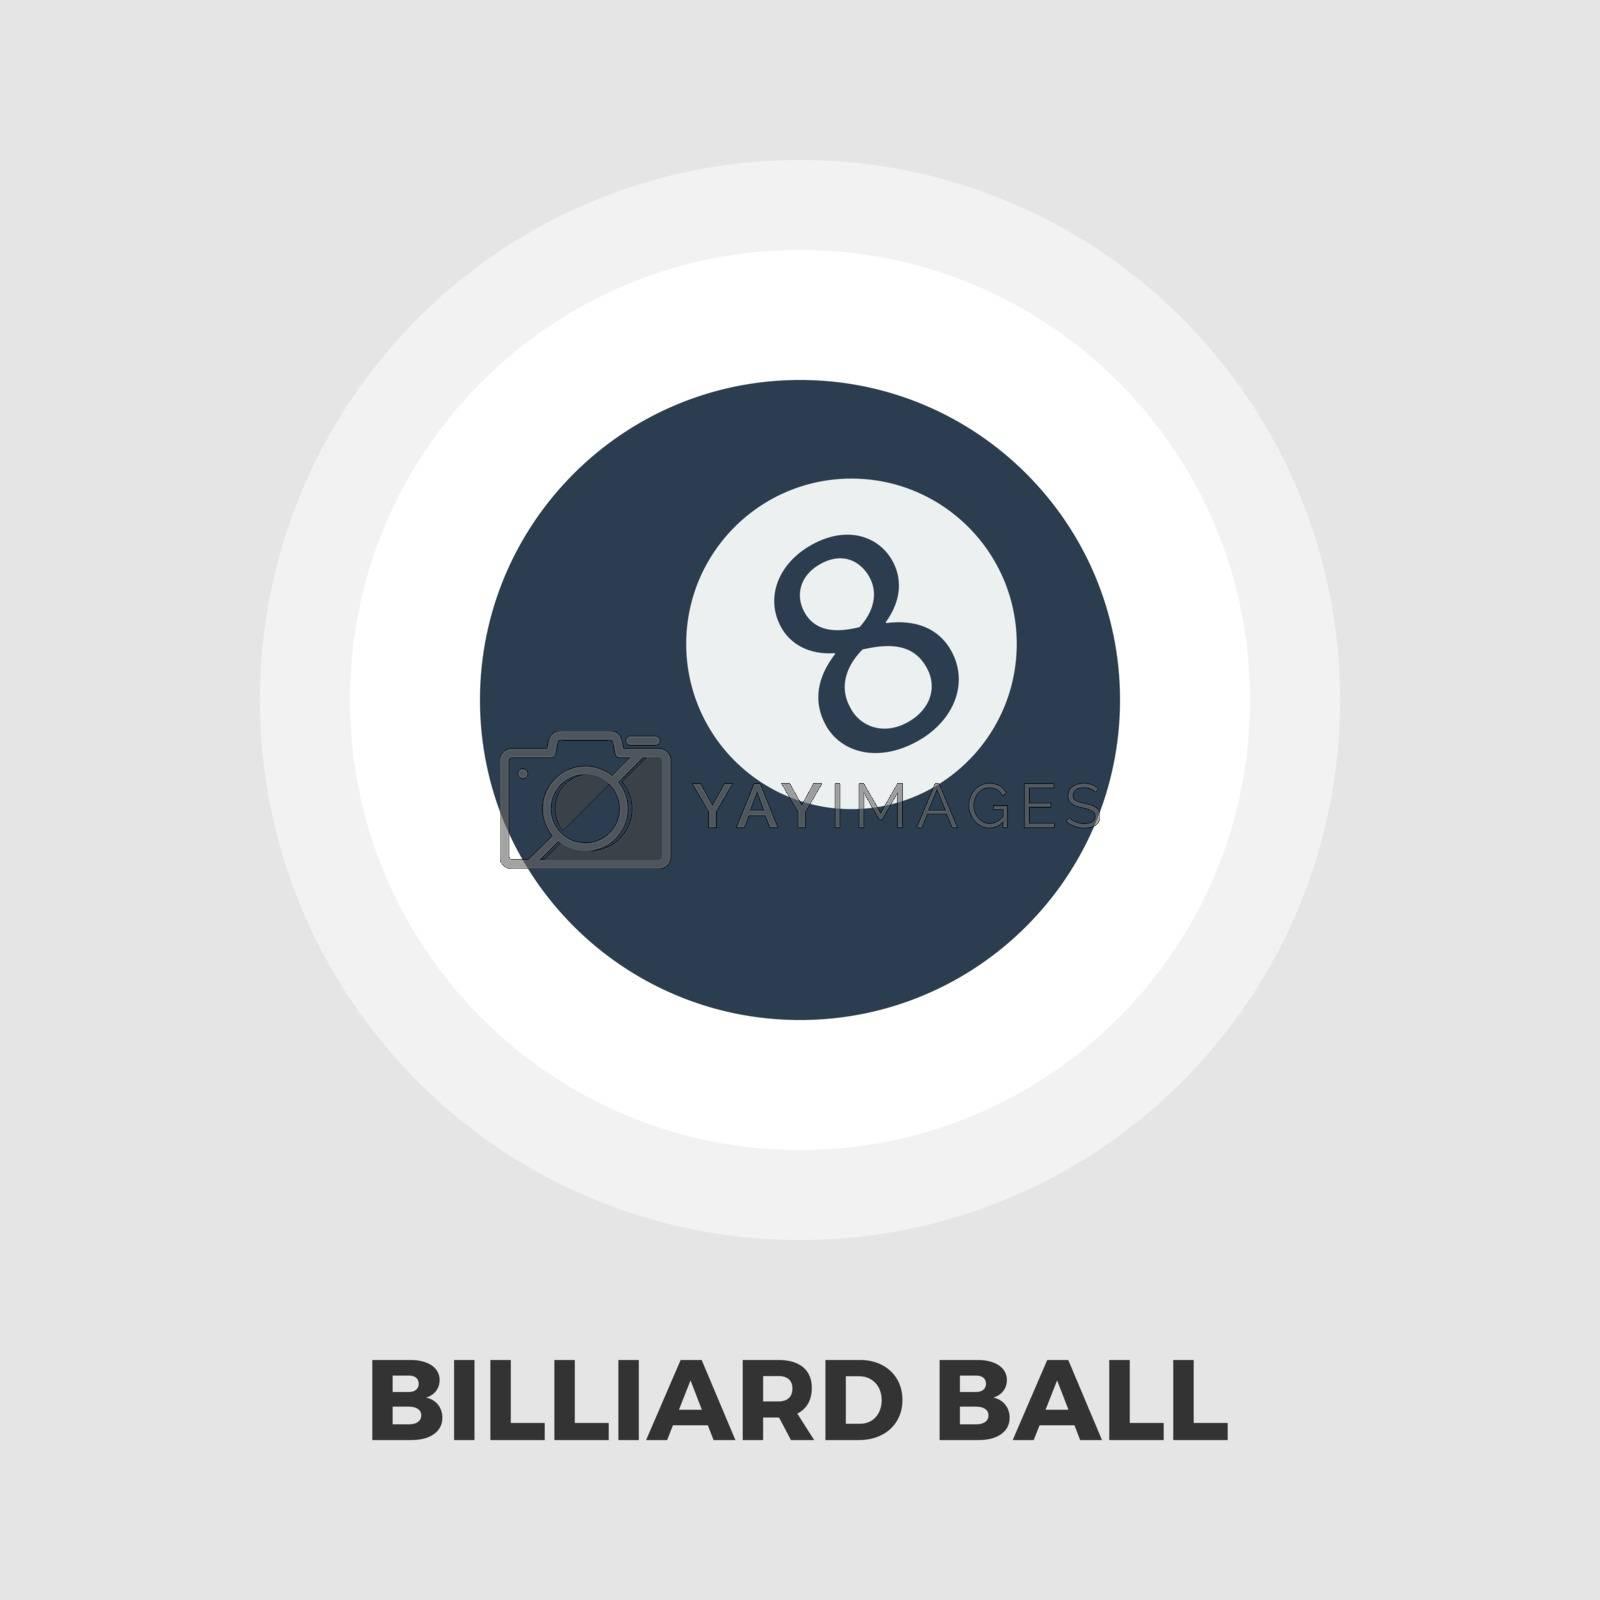 Billiard ball flat icon by smoki